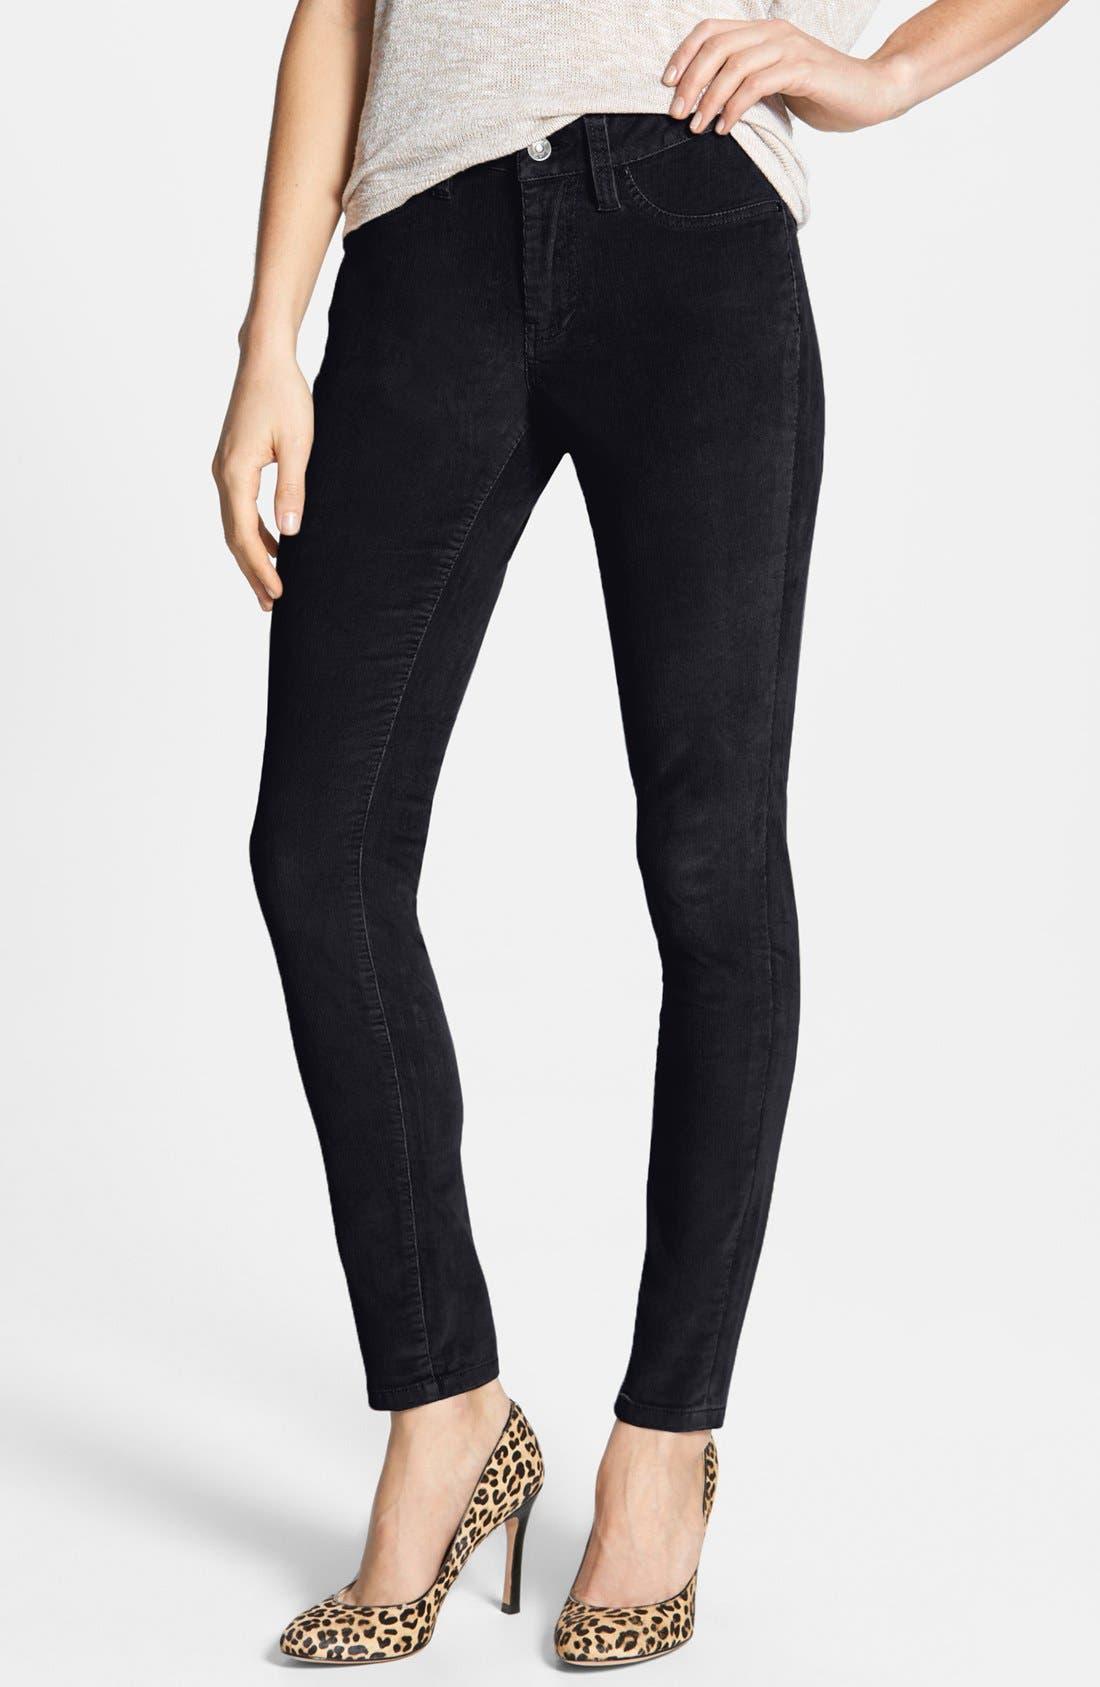 Main Image - Jag Jeans 'Olivia' Corduroy Leggings (Petite)